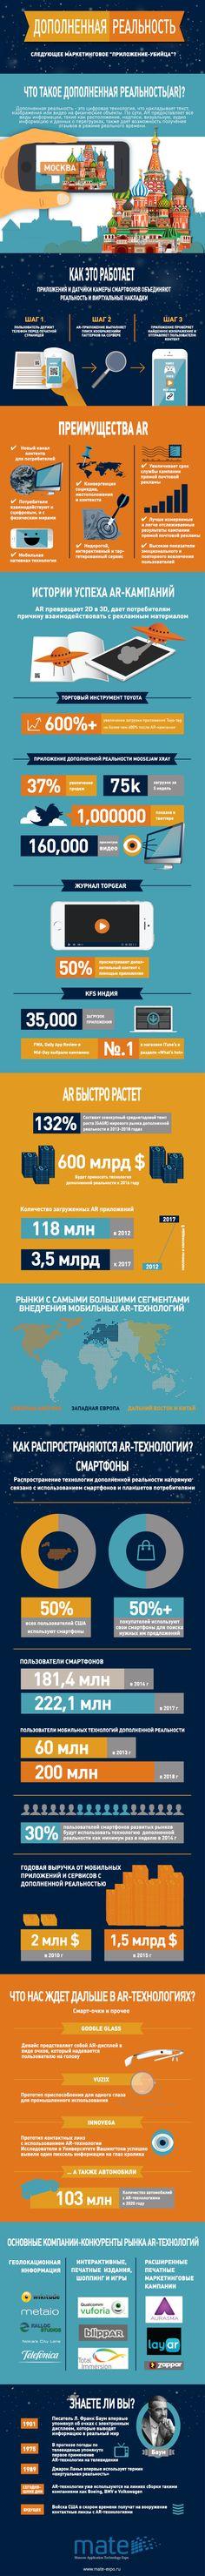 Инфографика: AR-технологии в цифрах и фактах  http://www.mate-expo.ru/ru/content/infografika-ar-tehnologii-v-cifrah-i-faktah